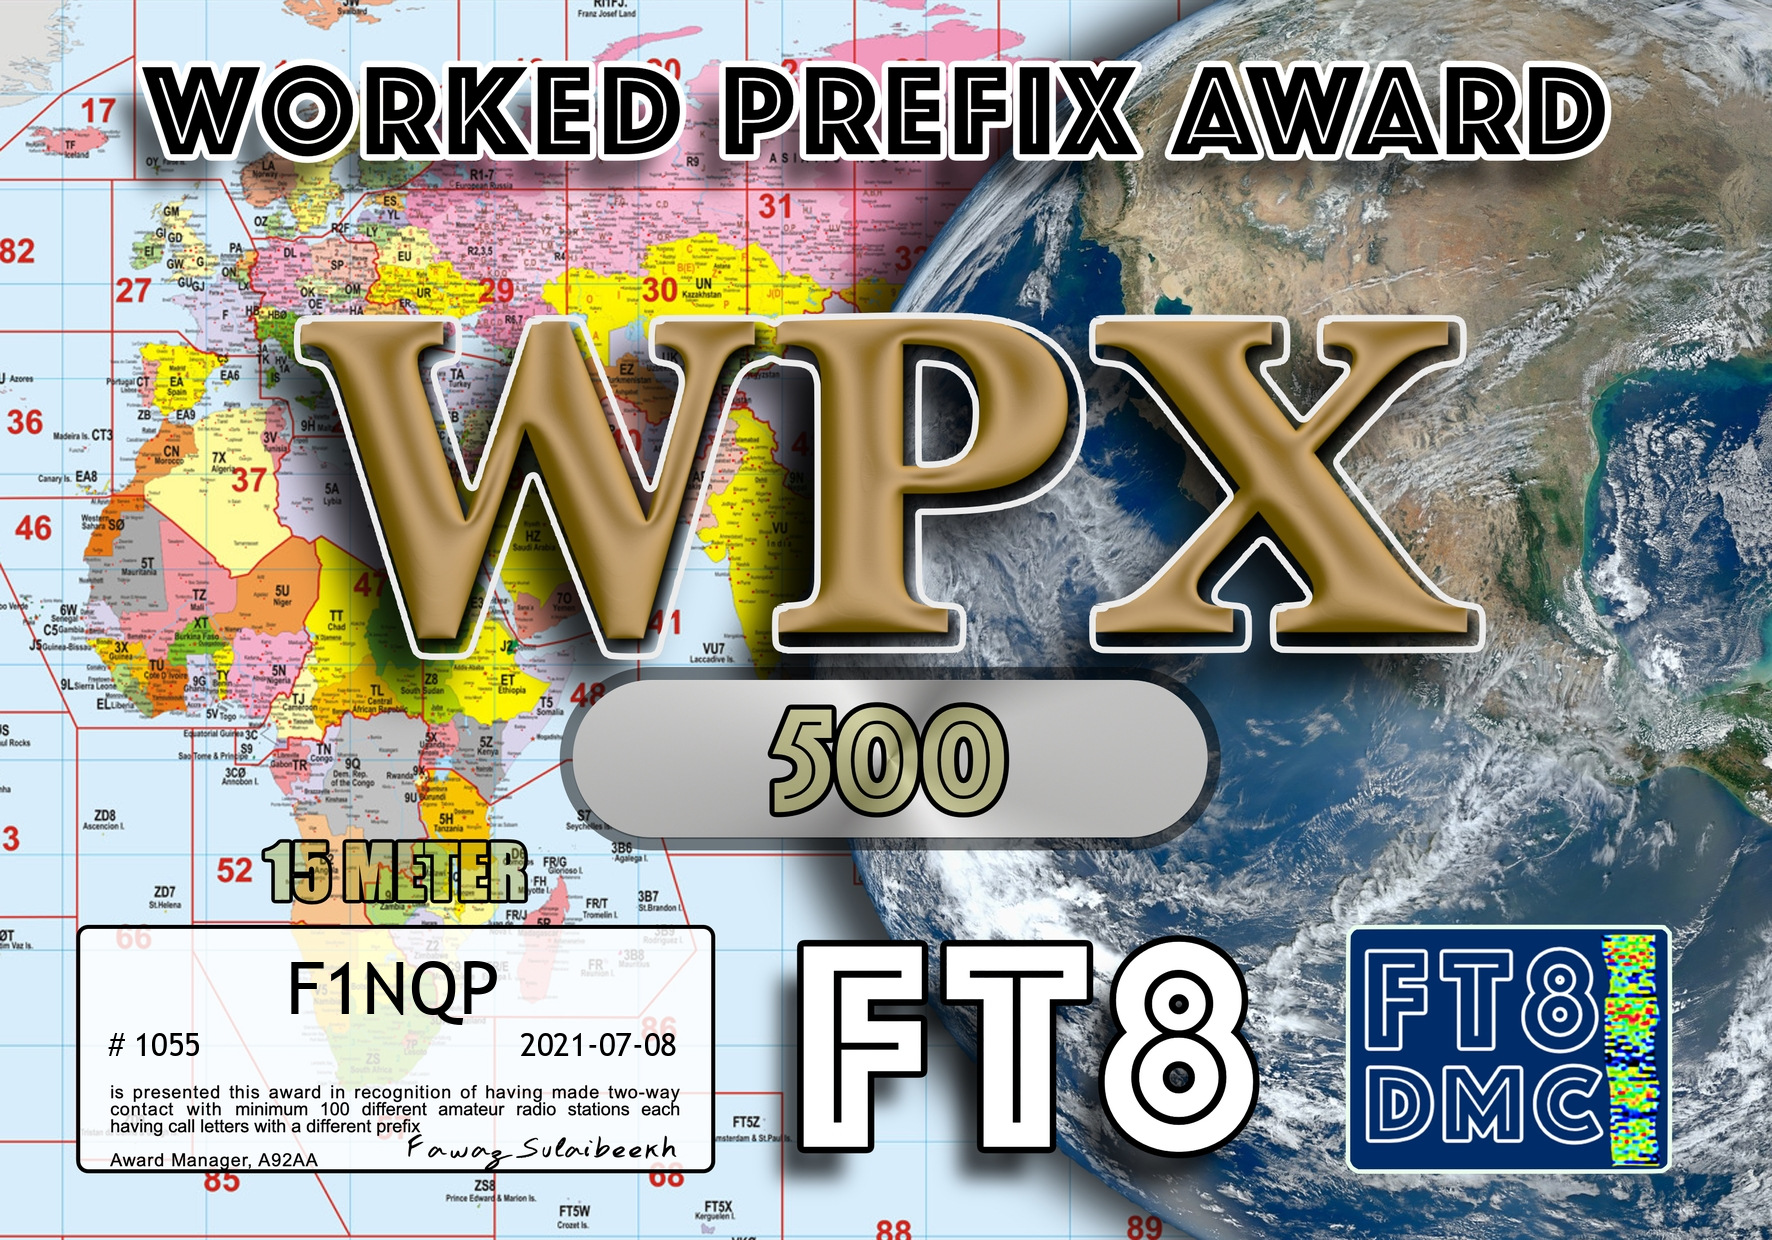 F1NQP-WPX15-500_FT8DMC.jpg